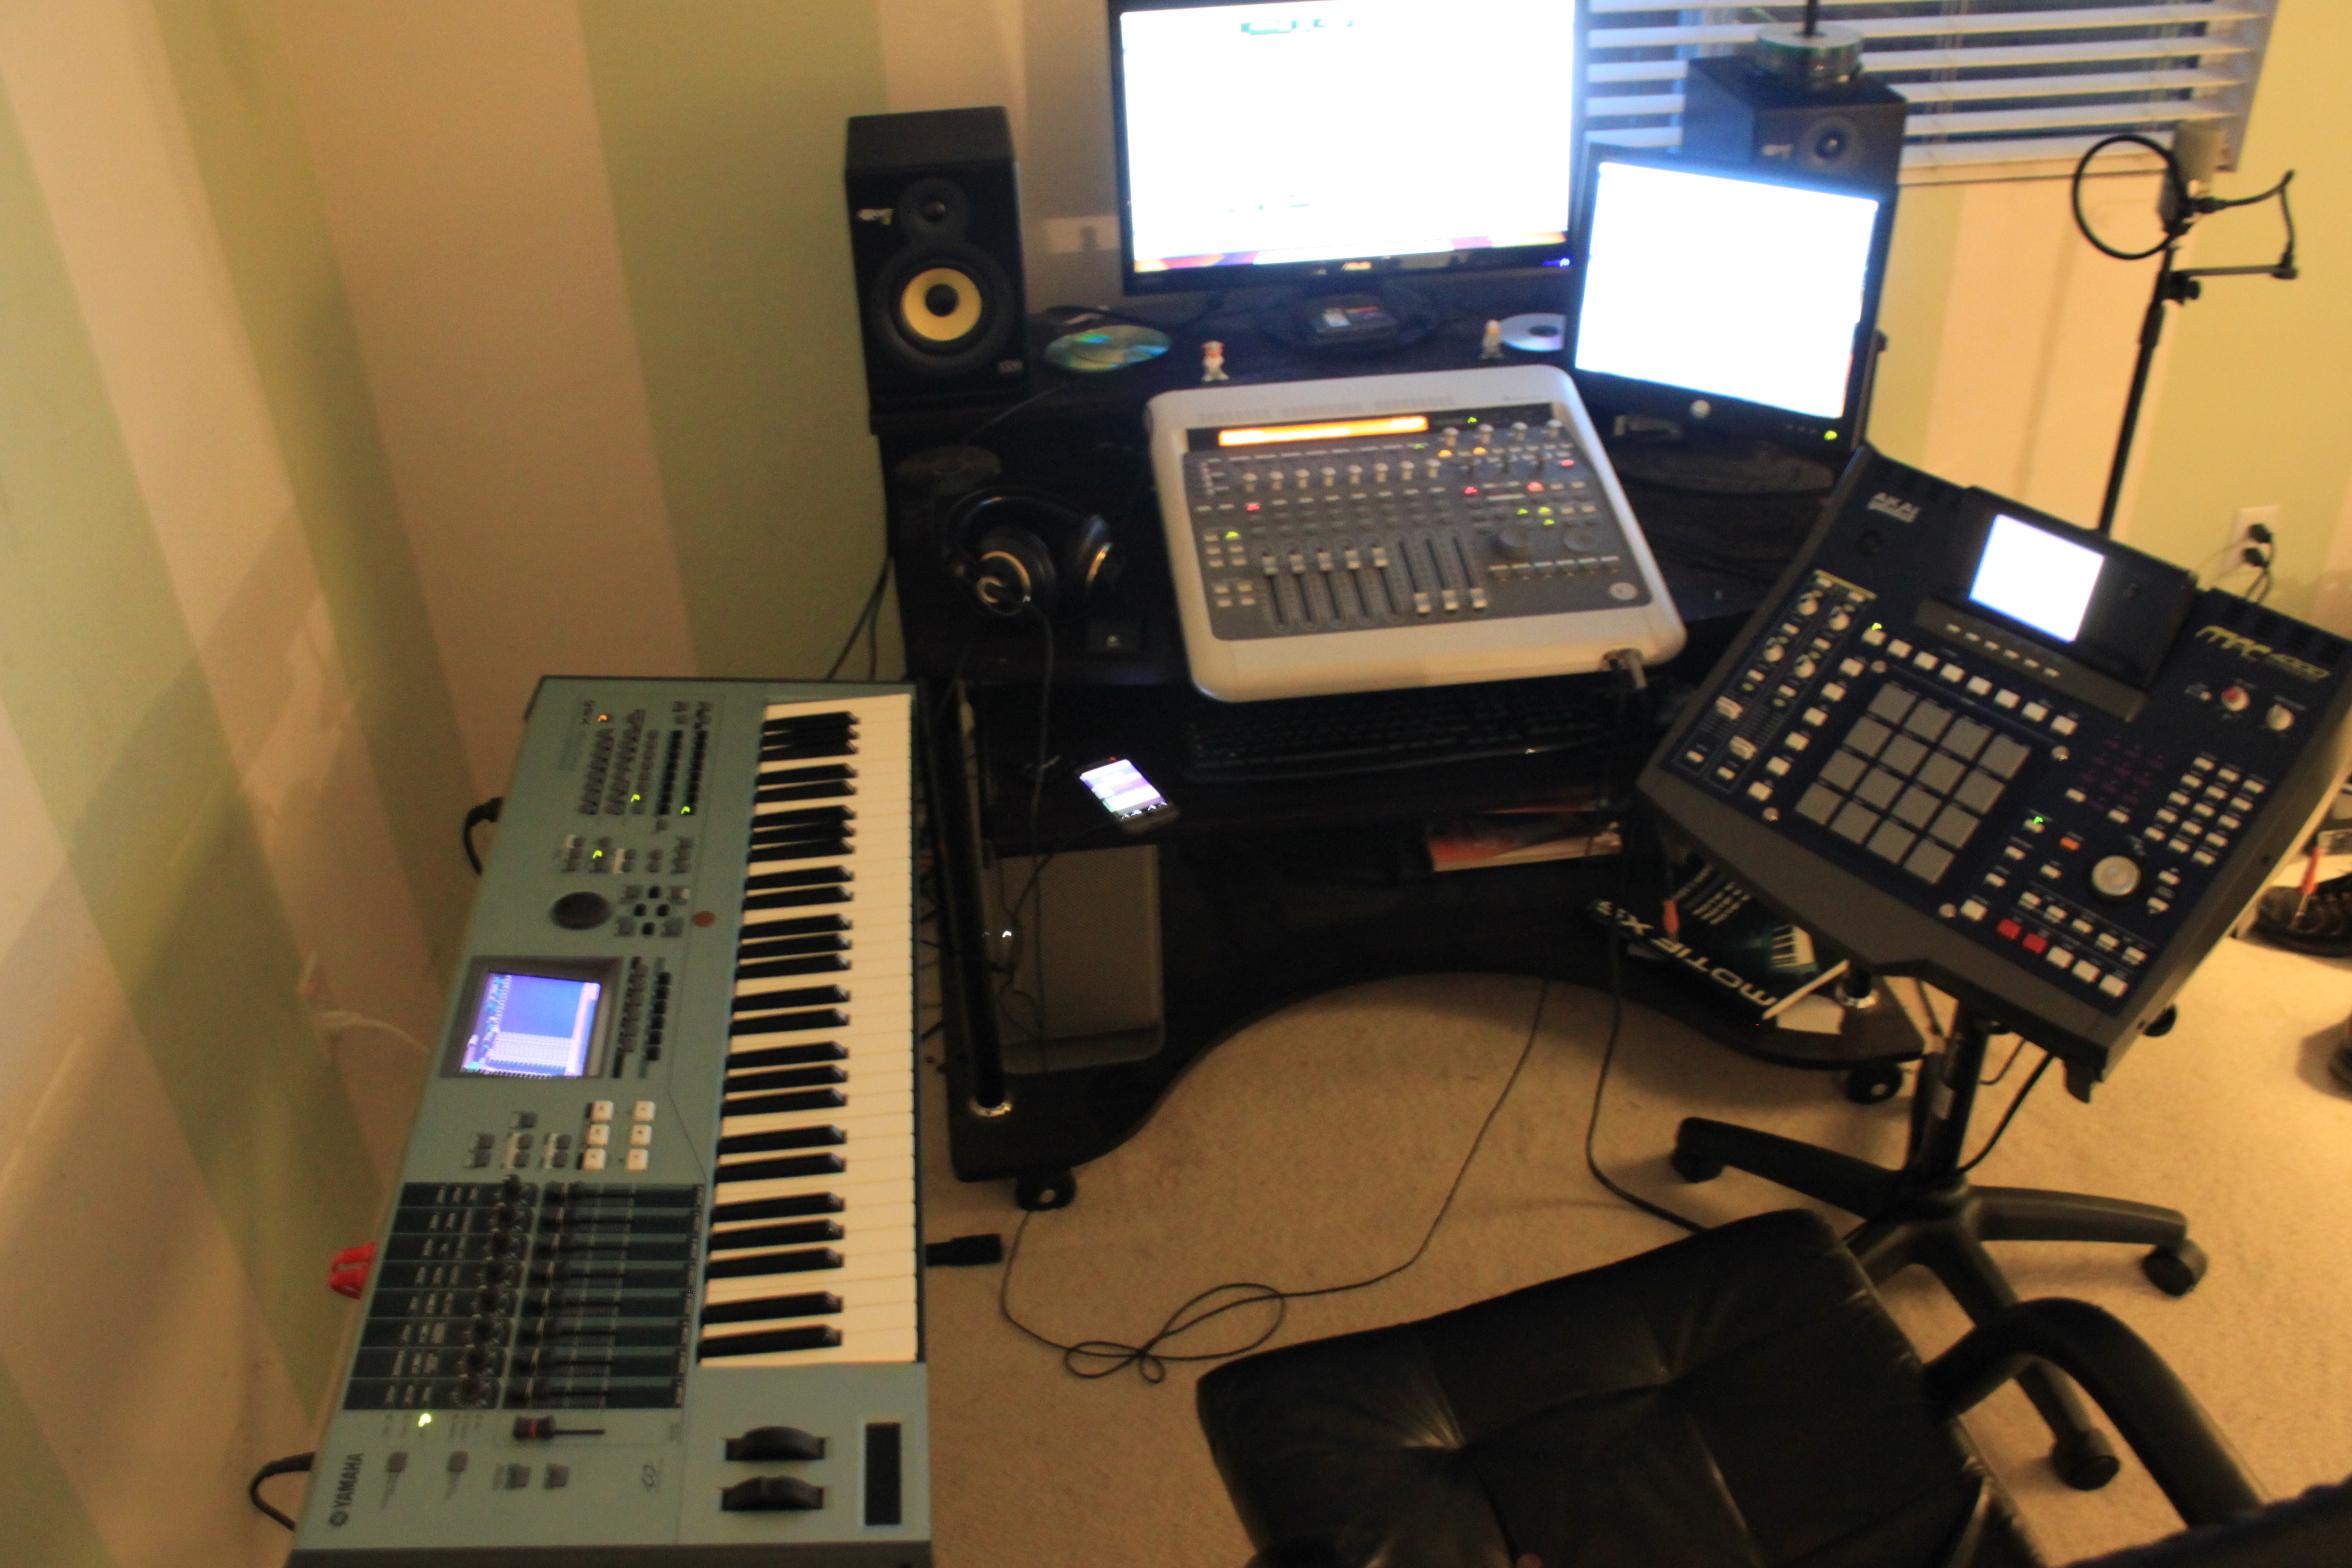 MPC 3000 vs. MPC 4000 - Page 4 - Gearslutz Pro Audio Community